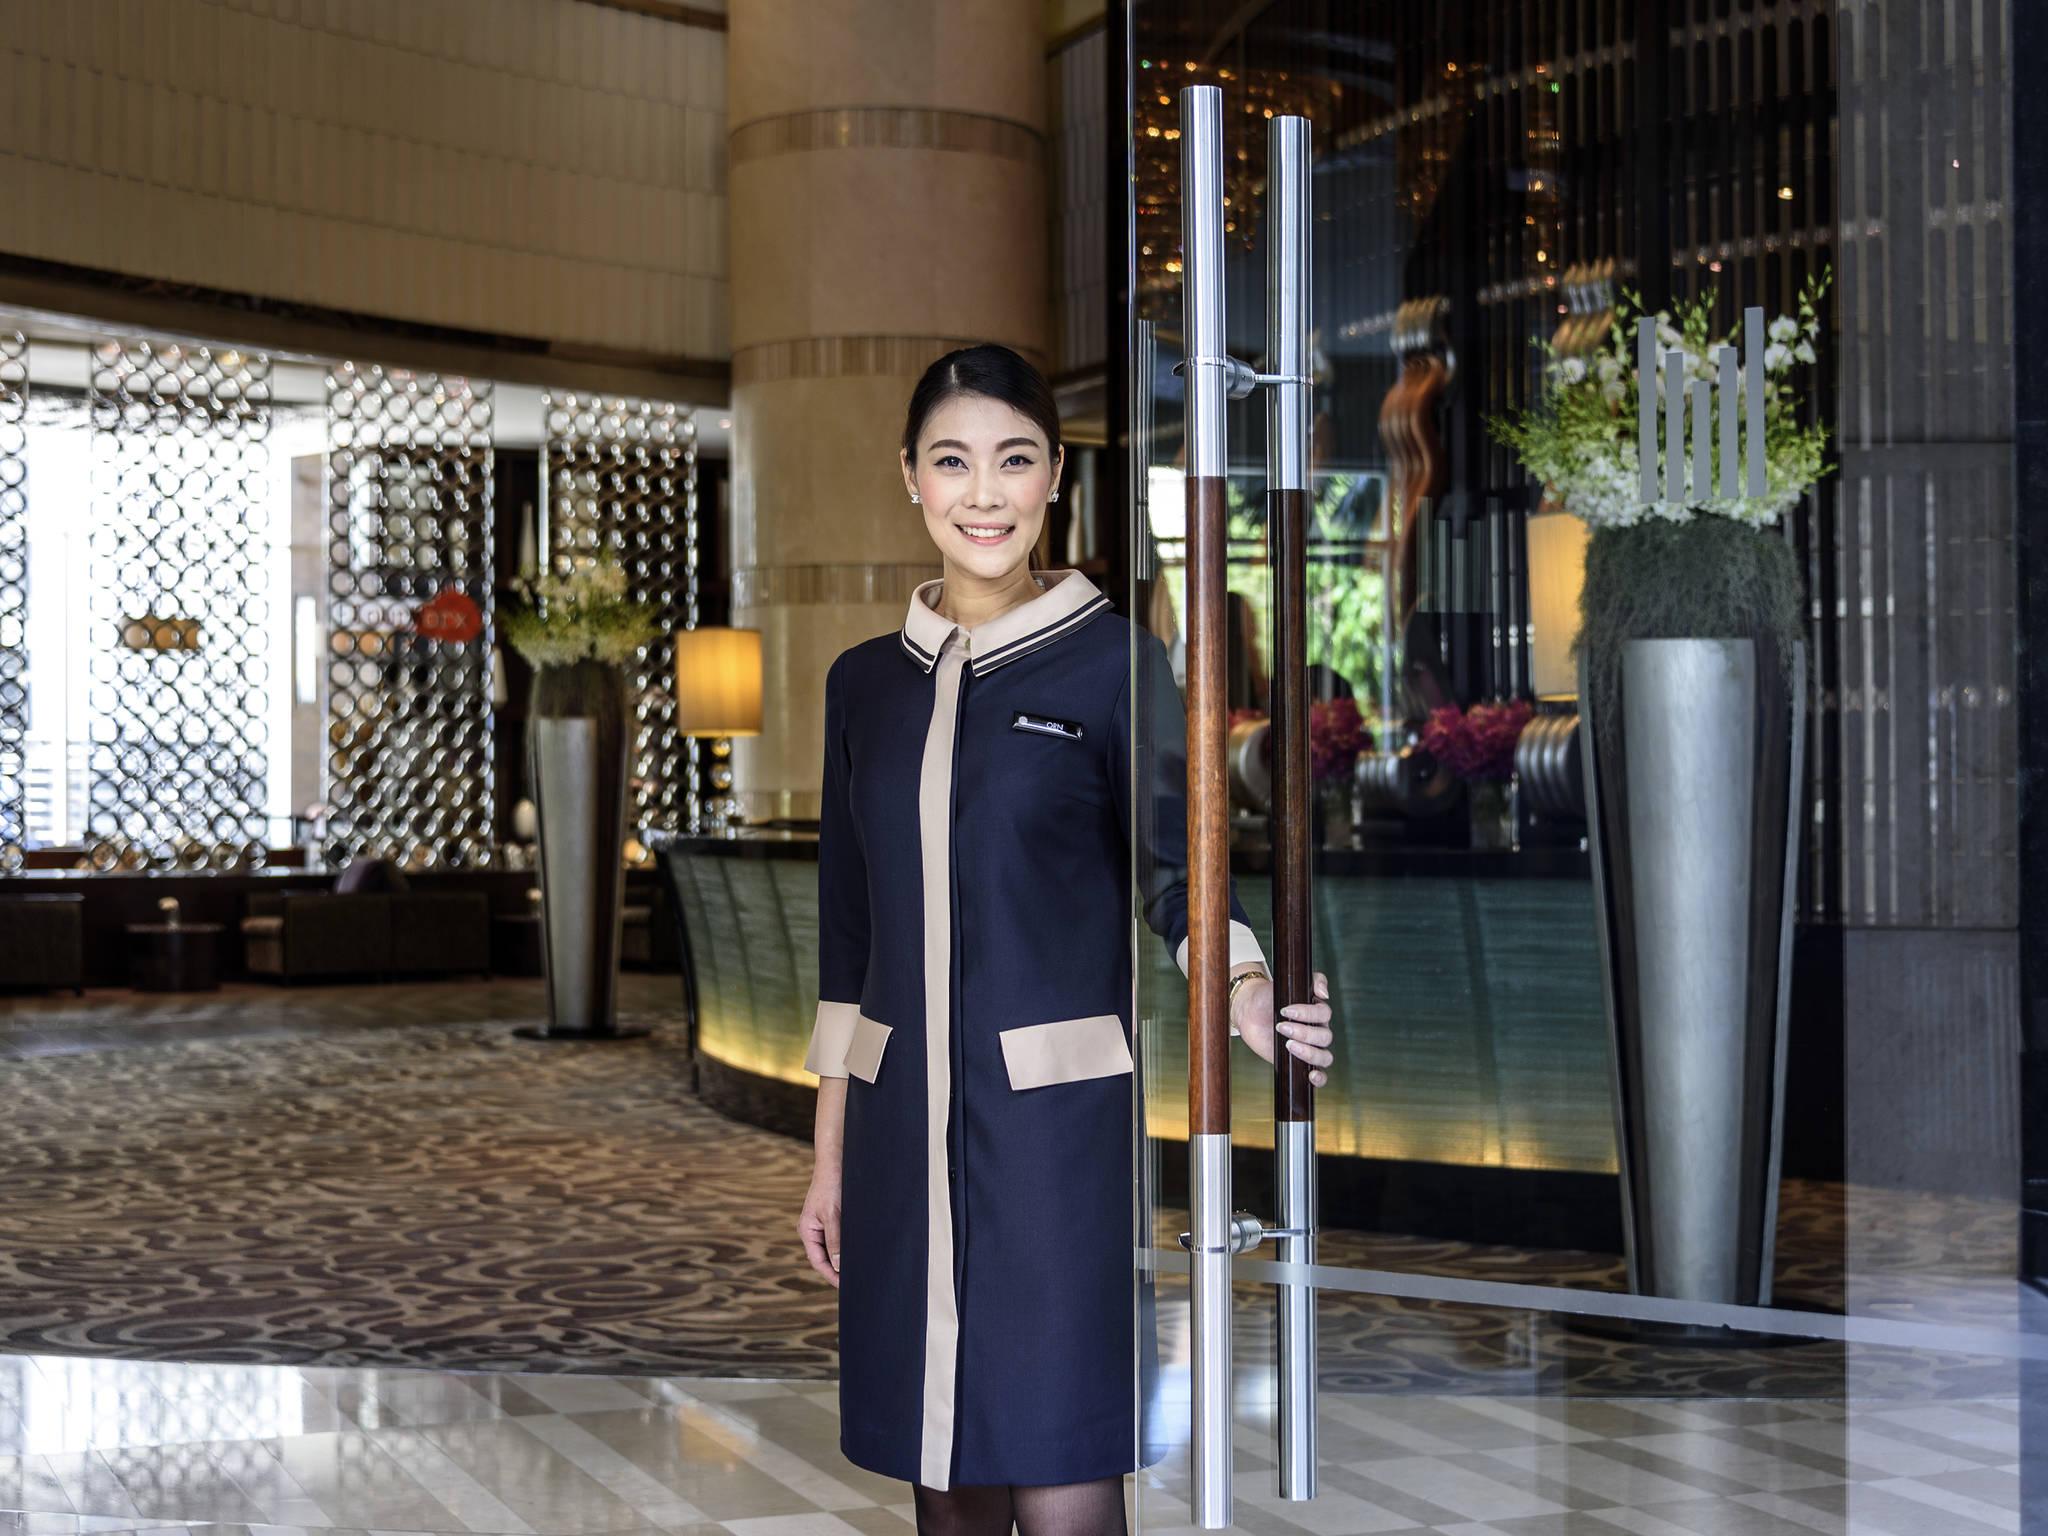 Hotel – Pullman Baotou (apertura en diciembre de 2018)